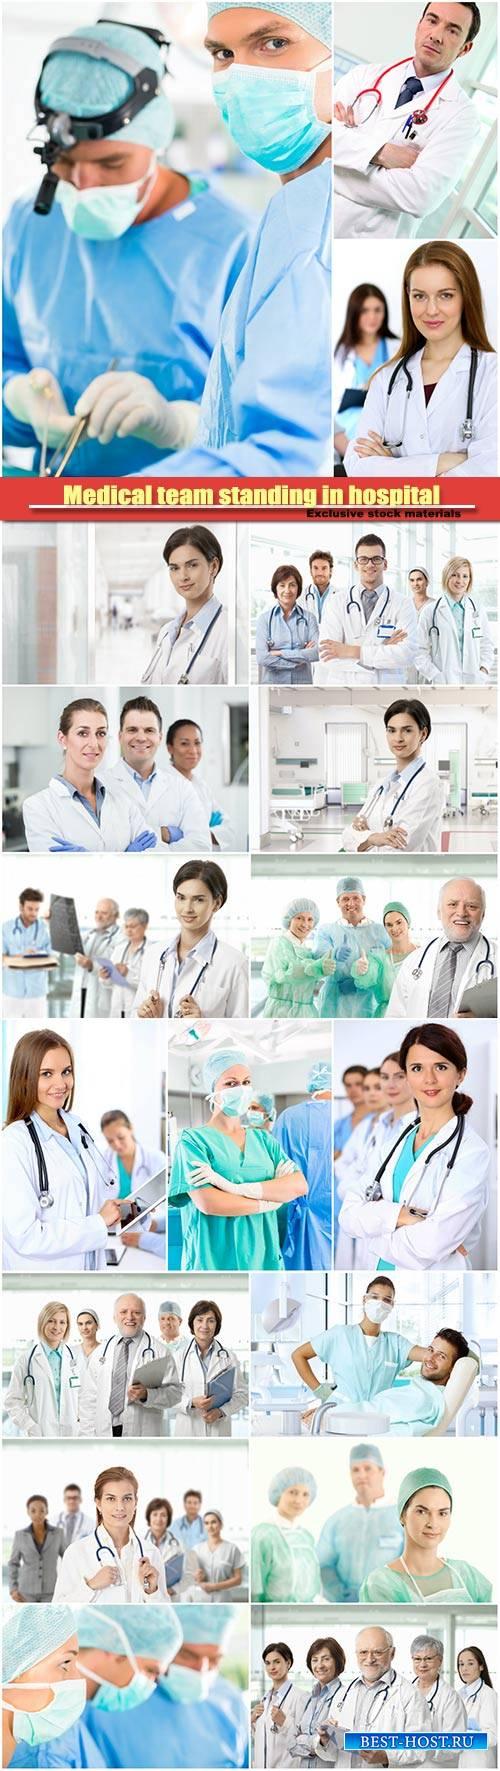 Medical team standing in hospital